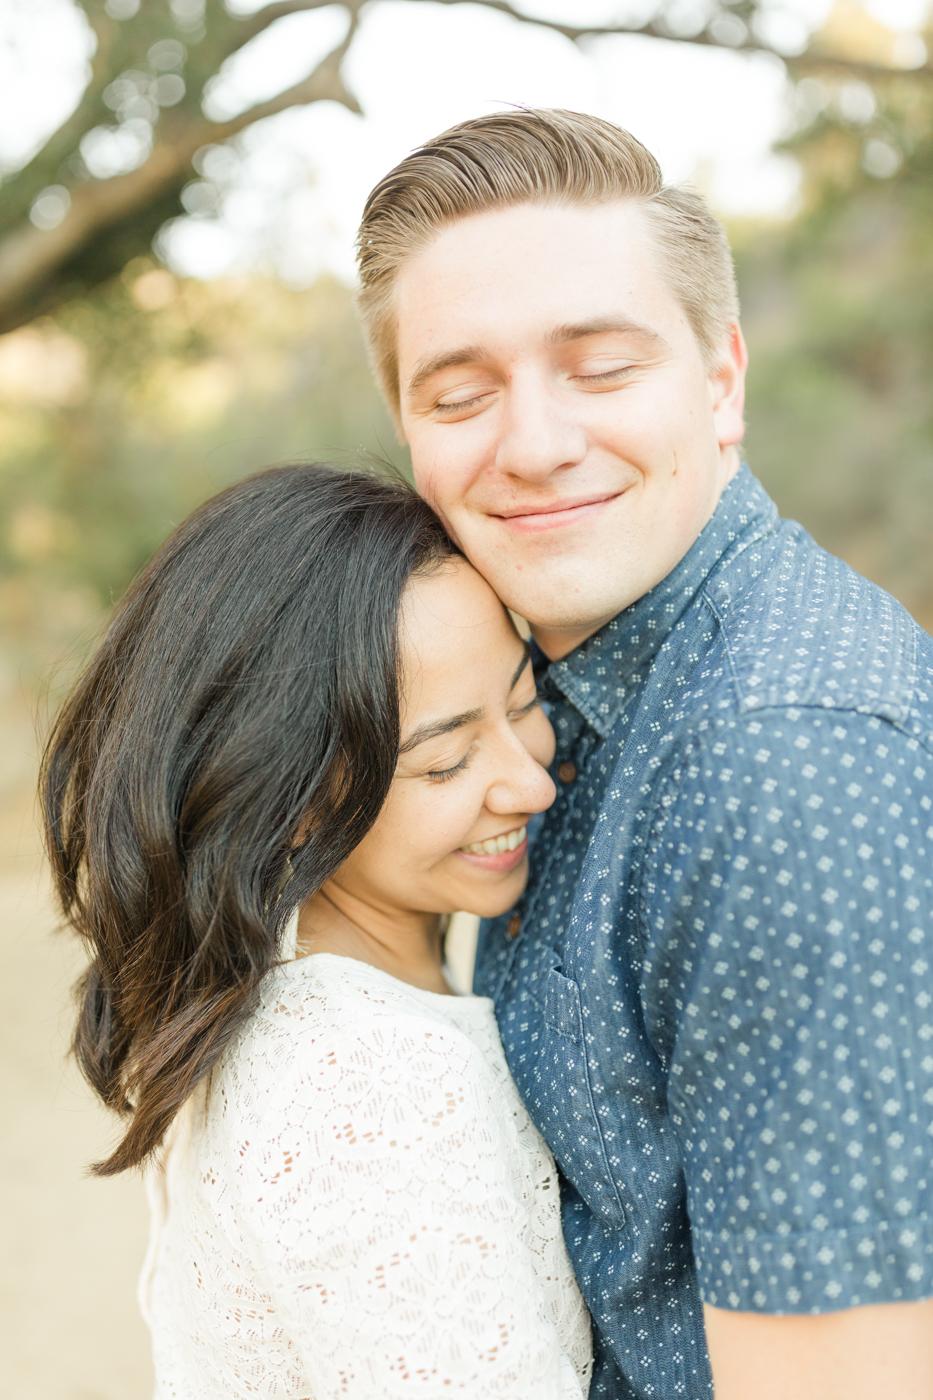 DTLA Engagement Session - Christa Norman Photography - Destination Wedding Photographer-40.jpg